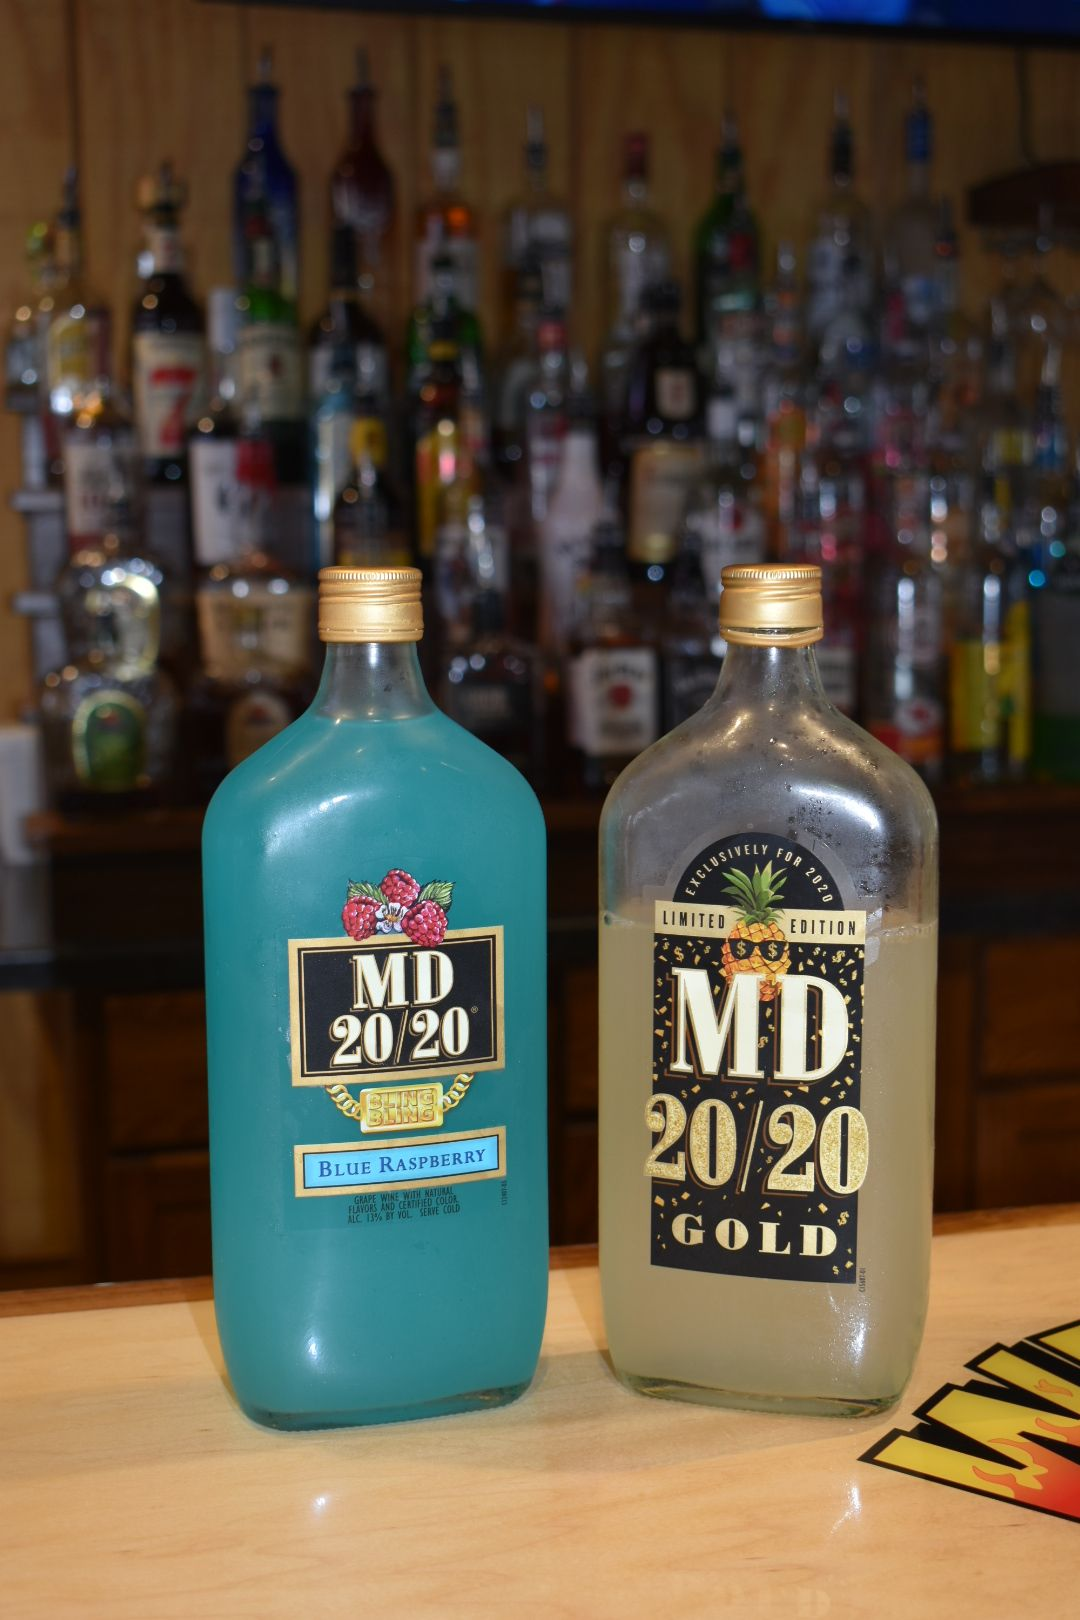 Md 20 20 Habanero Lime Arita Wine And Spirits Alcoholic Drinks Honest Tea Bottle